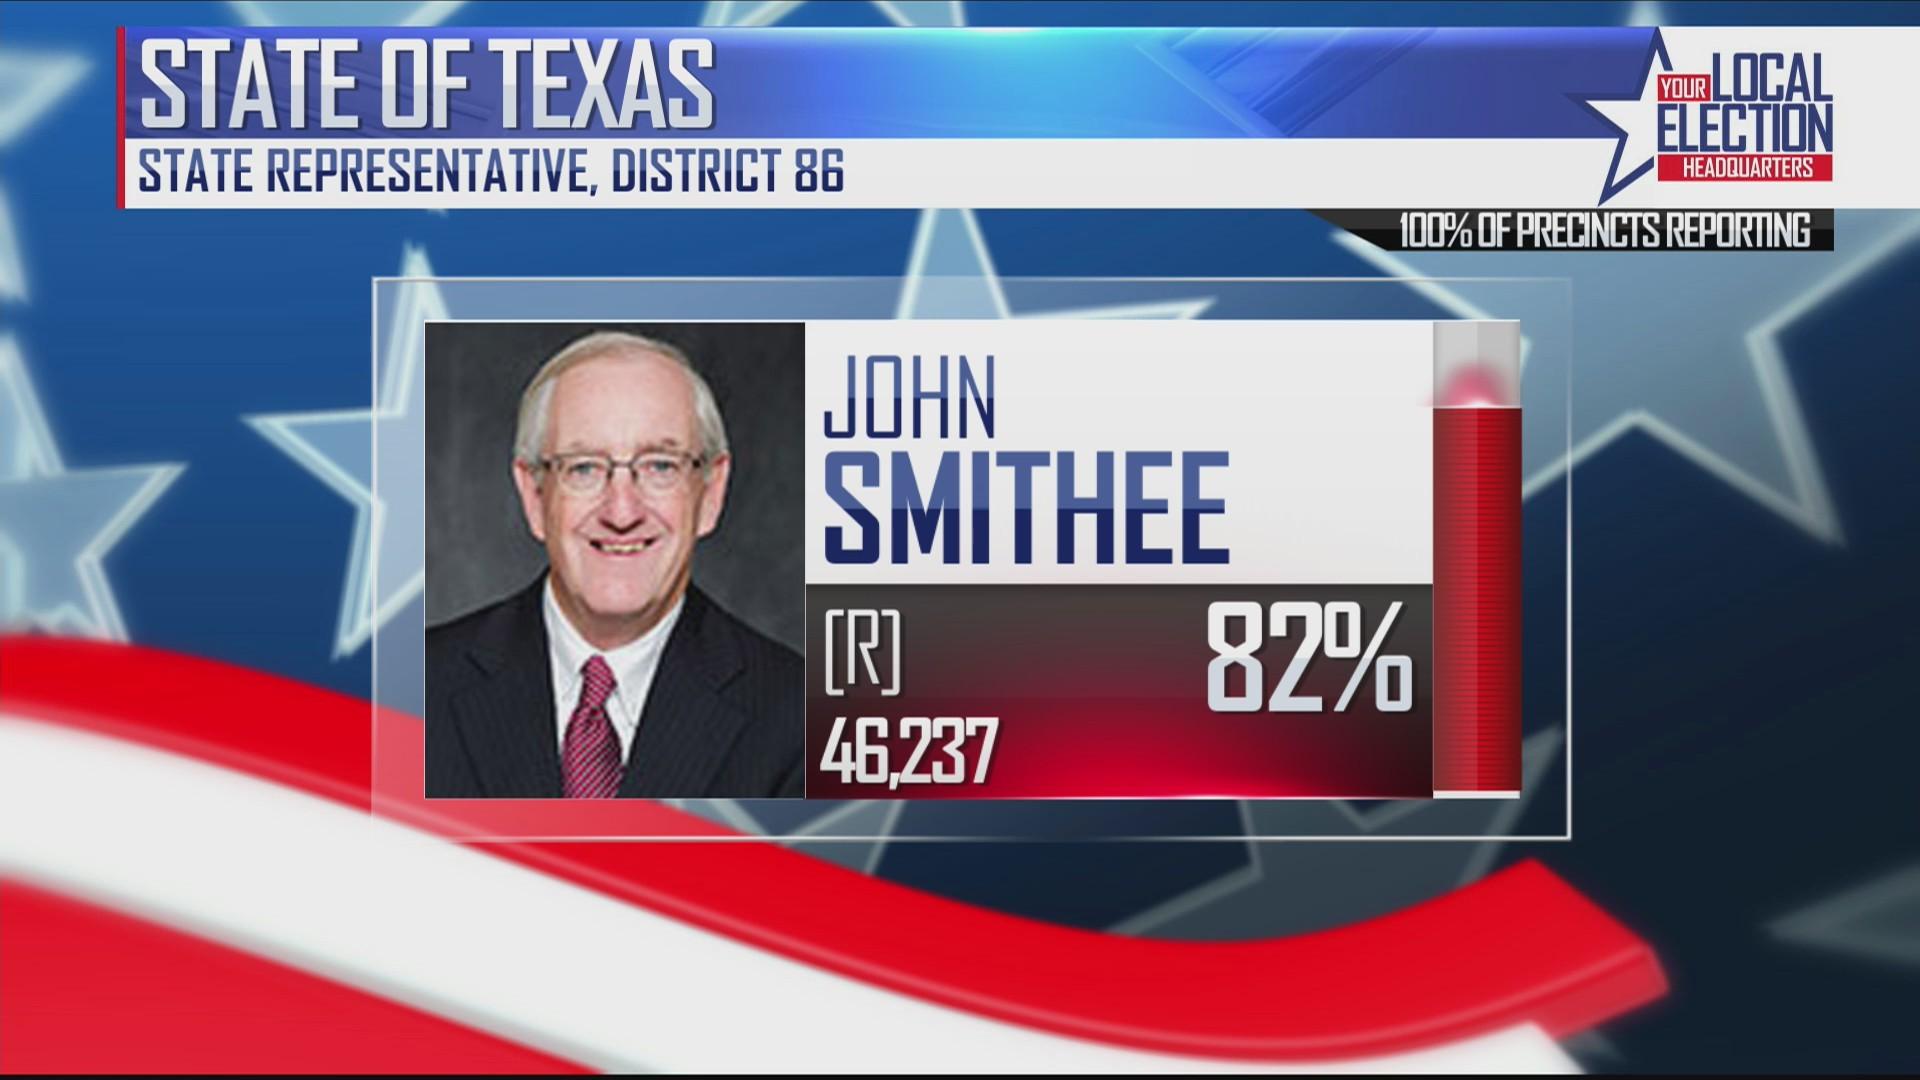 John Smithee Wins District 86 Again